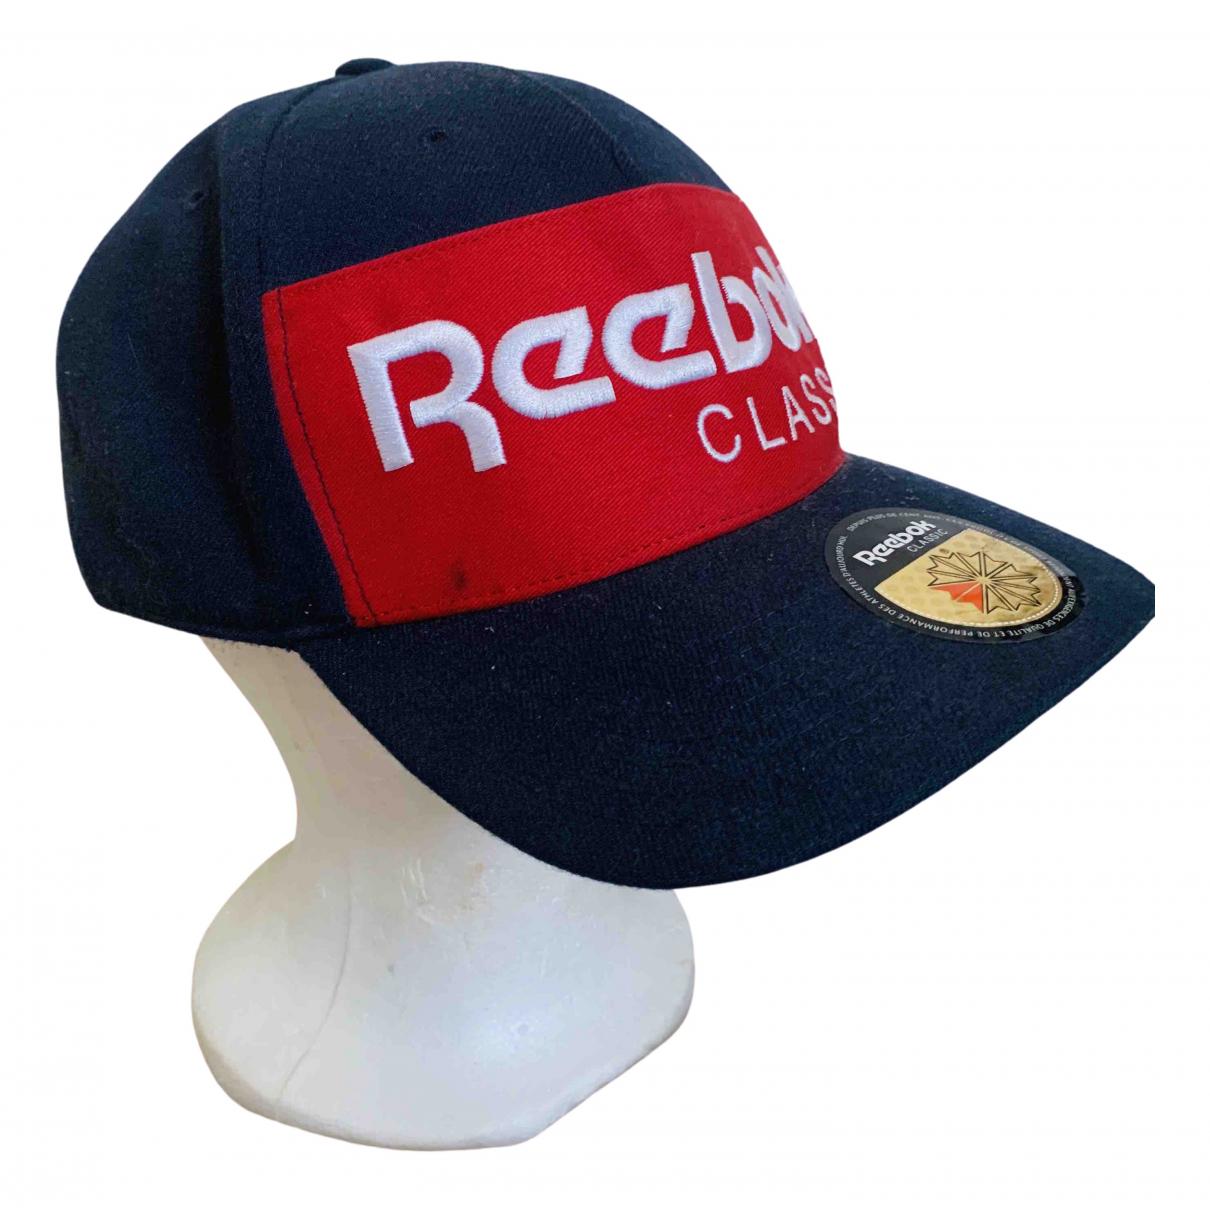 Reebok \N Blue Cotton hat & pull on hat for Men 57 cm